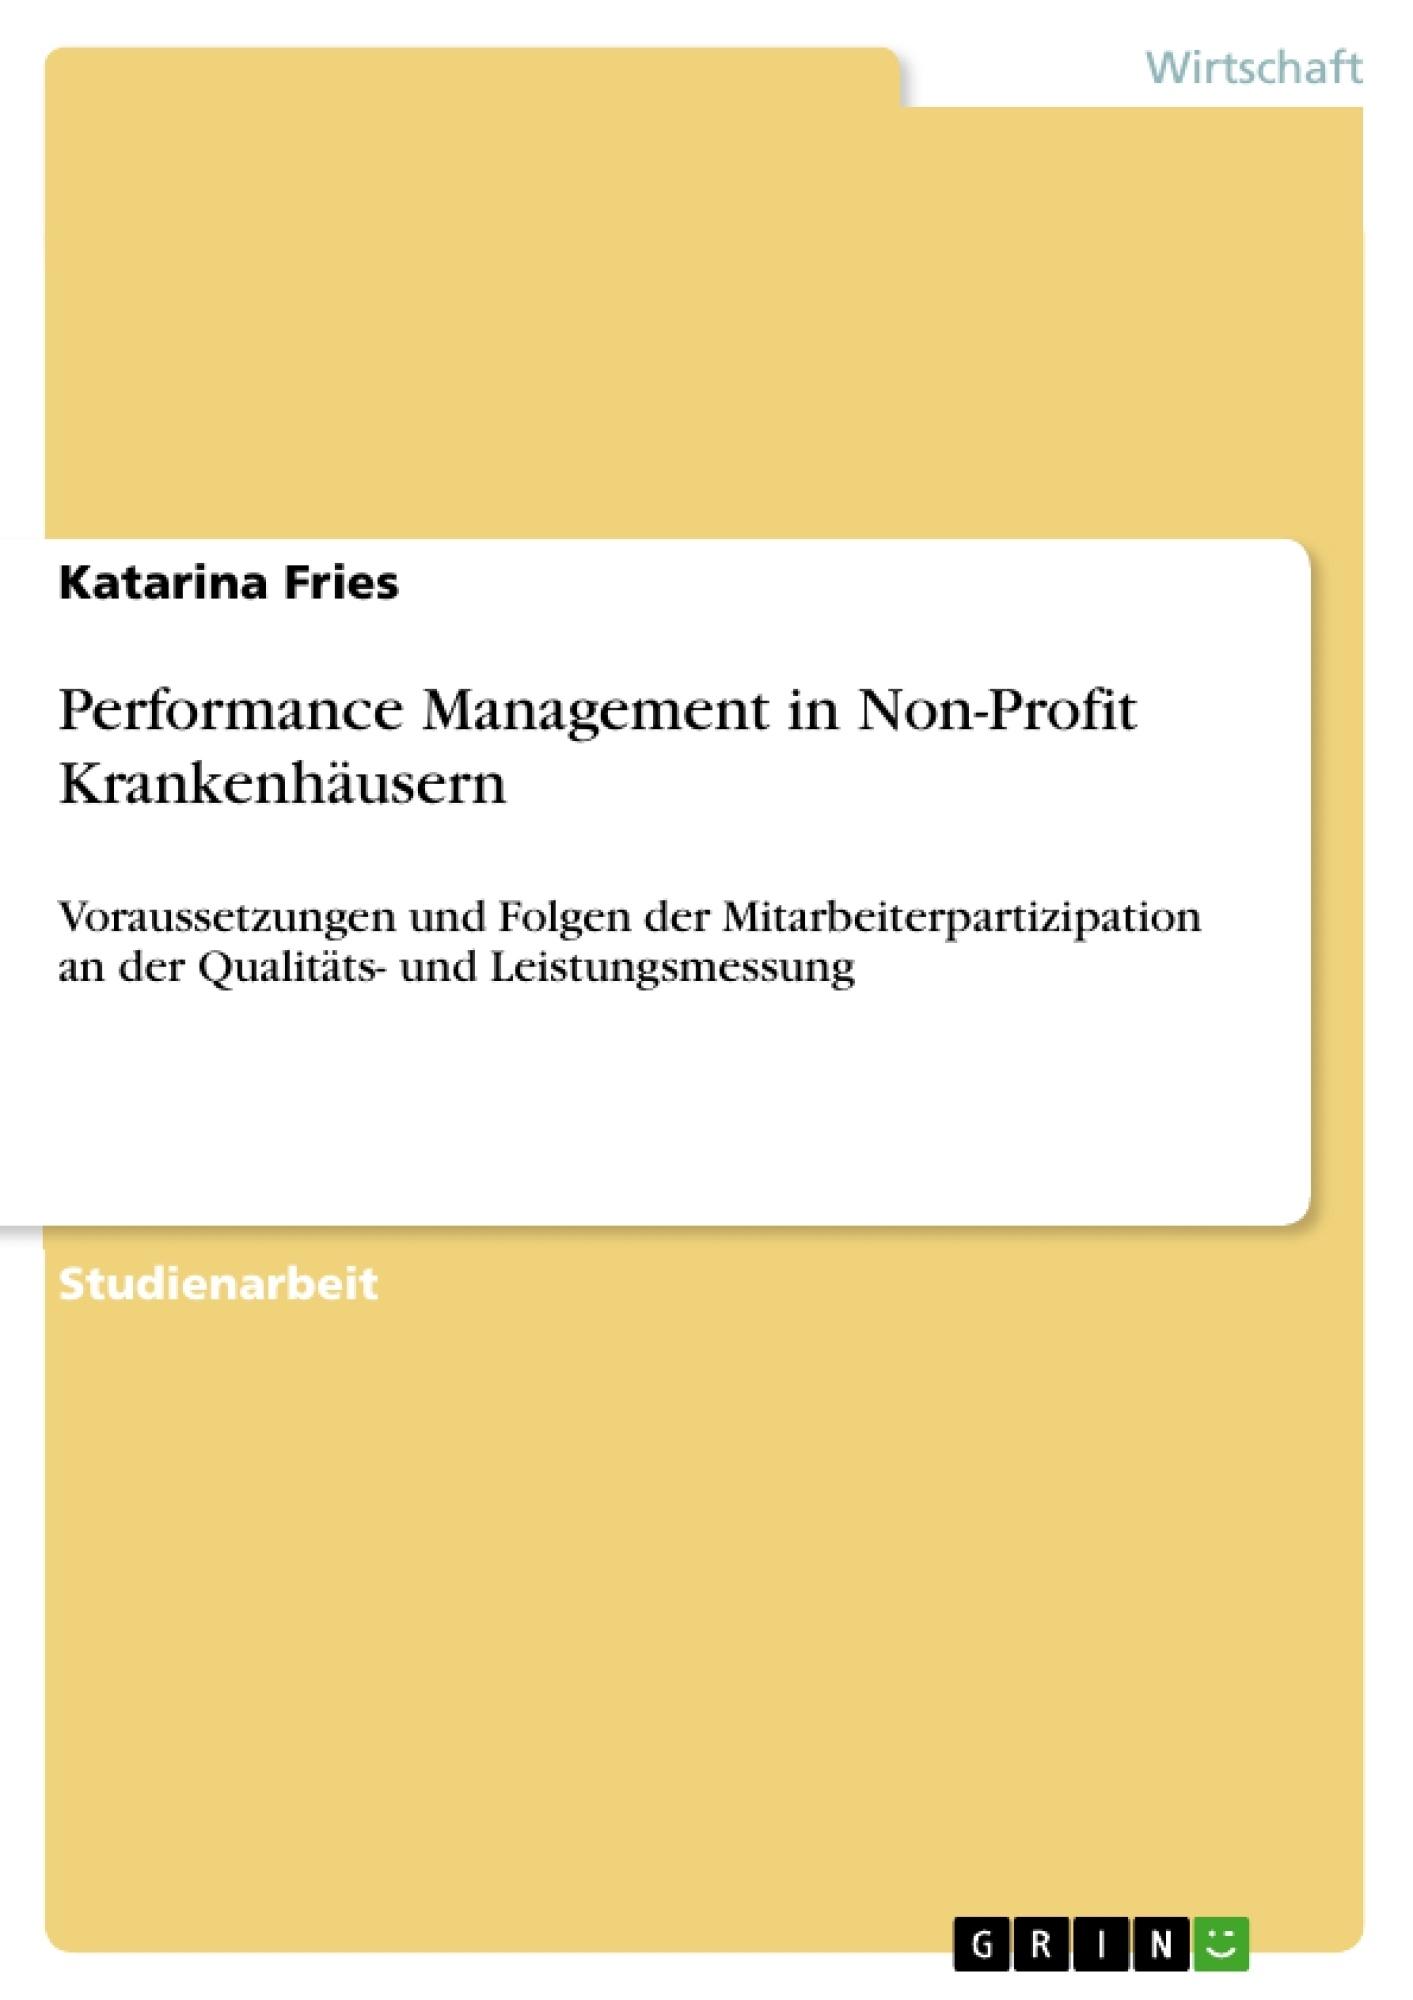 Titel: Performance Management in Non-Profit Krankenhäusern